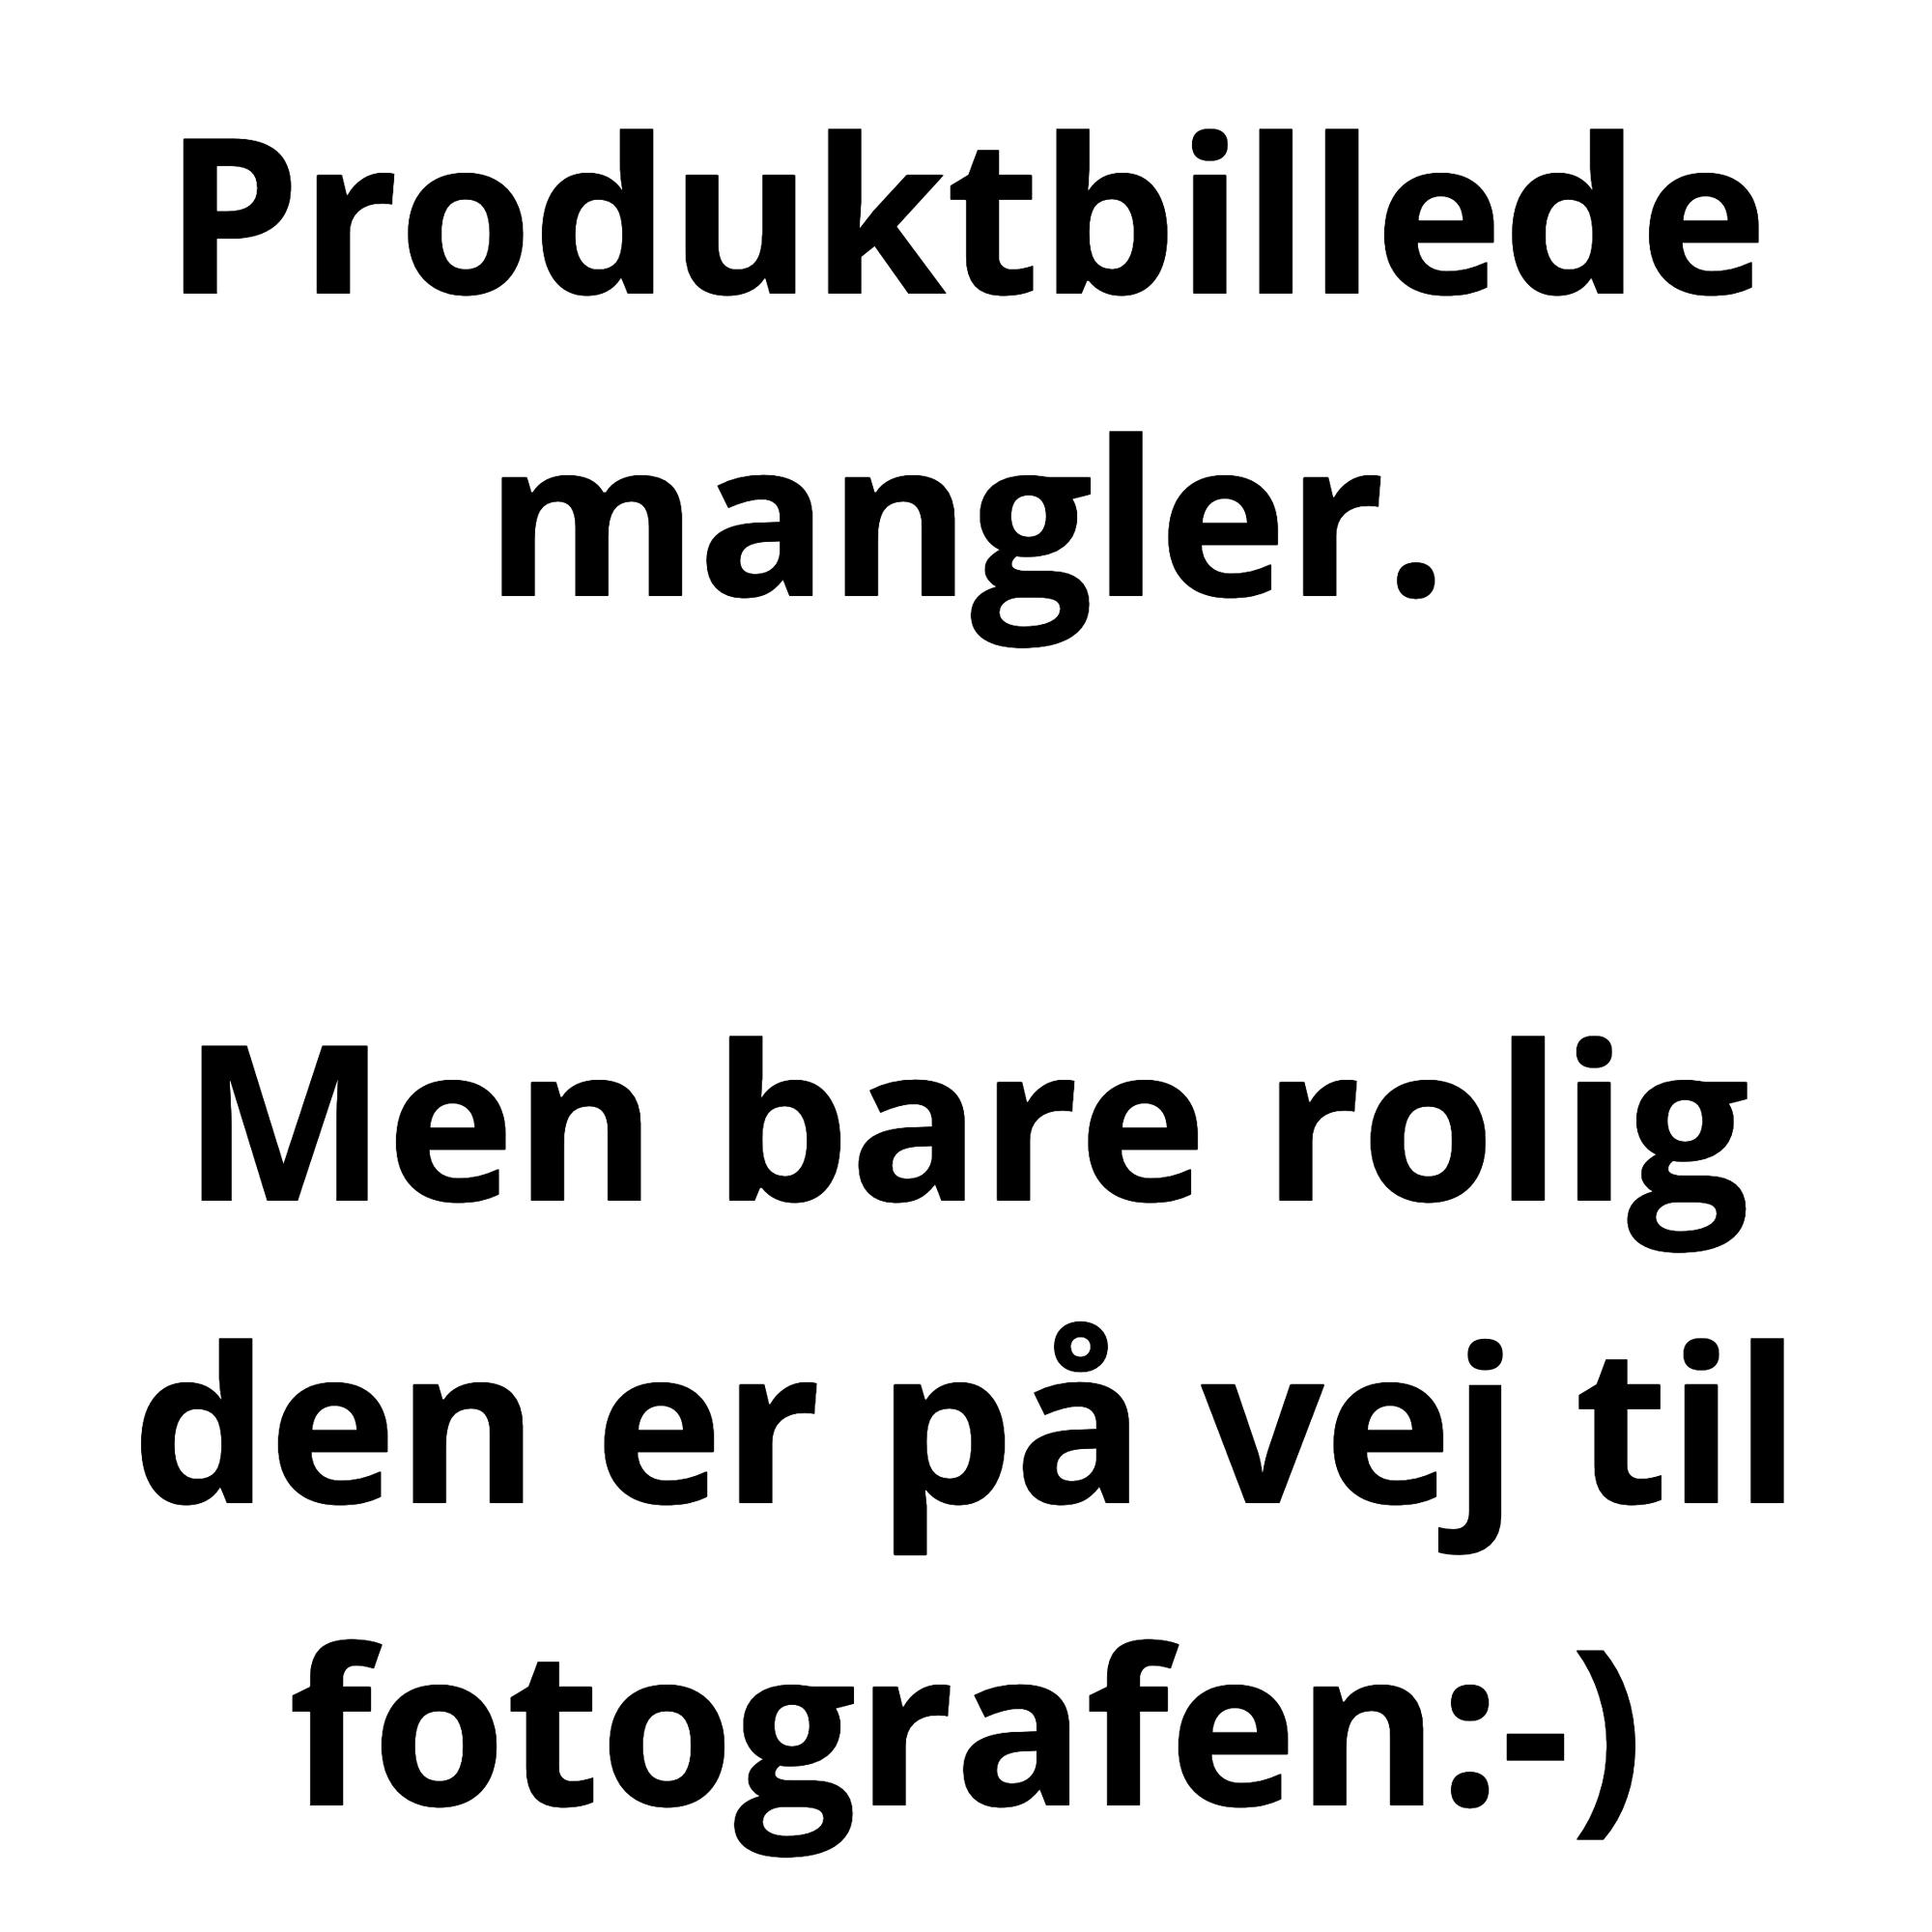 Brodit Aktiv Mobilholder med cigar adapter til Apple iPhone 6S Plus/7 Plus/8 Plus/Xs Max - 521804